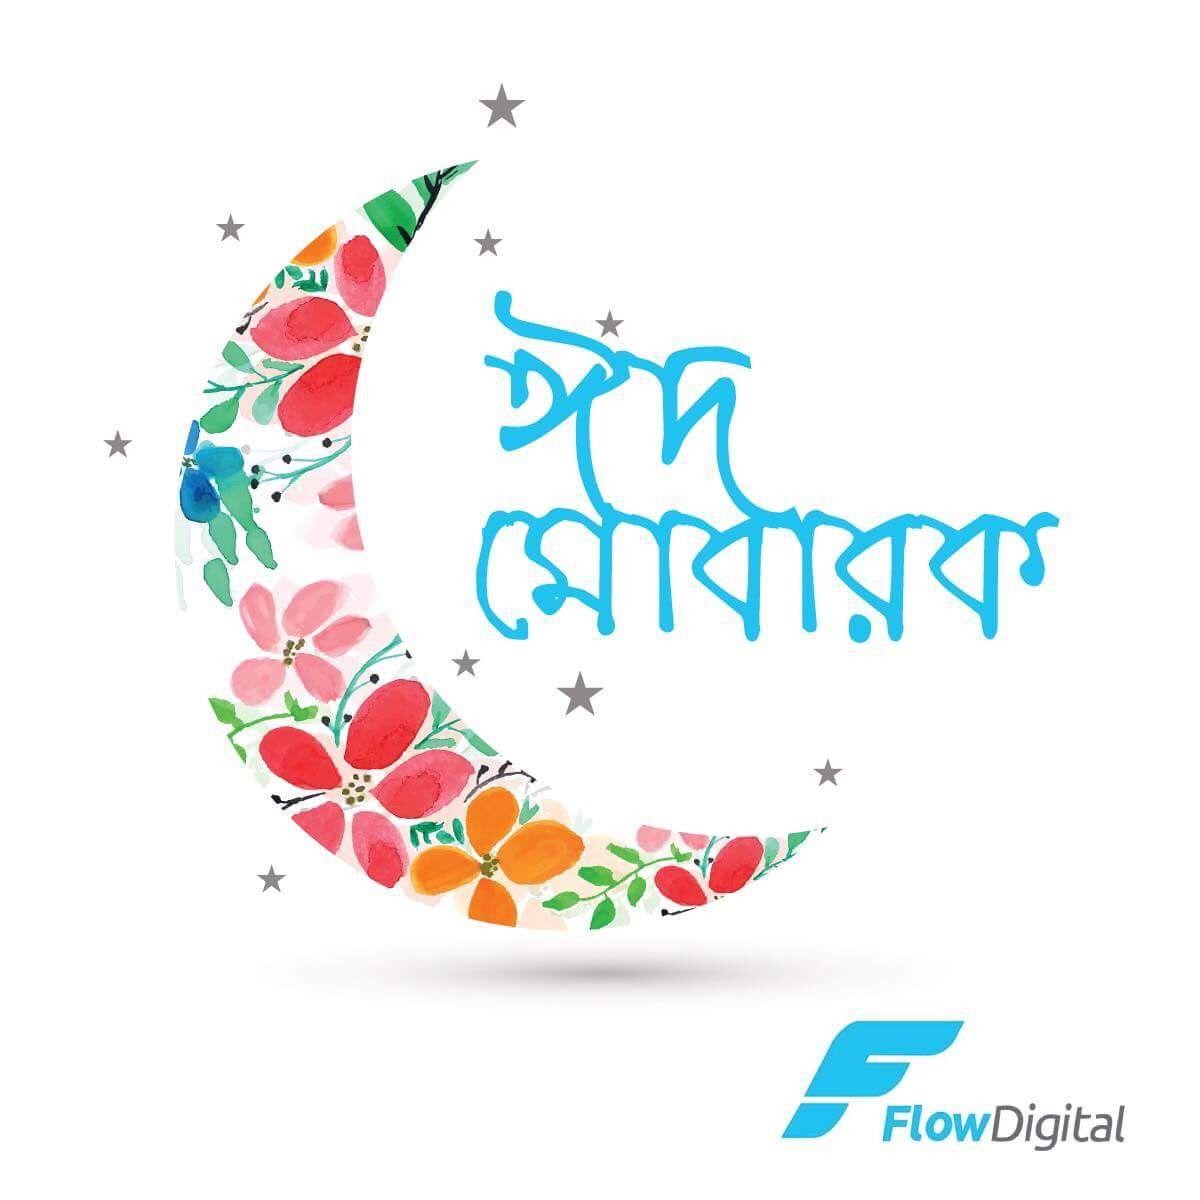 Eid Mubarak Eid mubarak, Arabic calligraphy, Eid